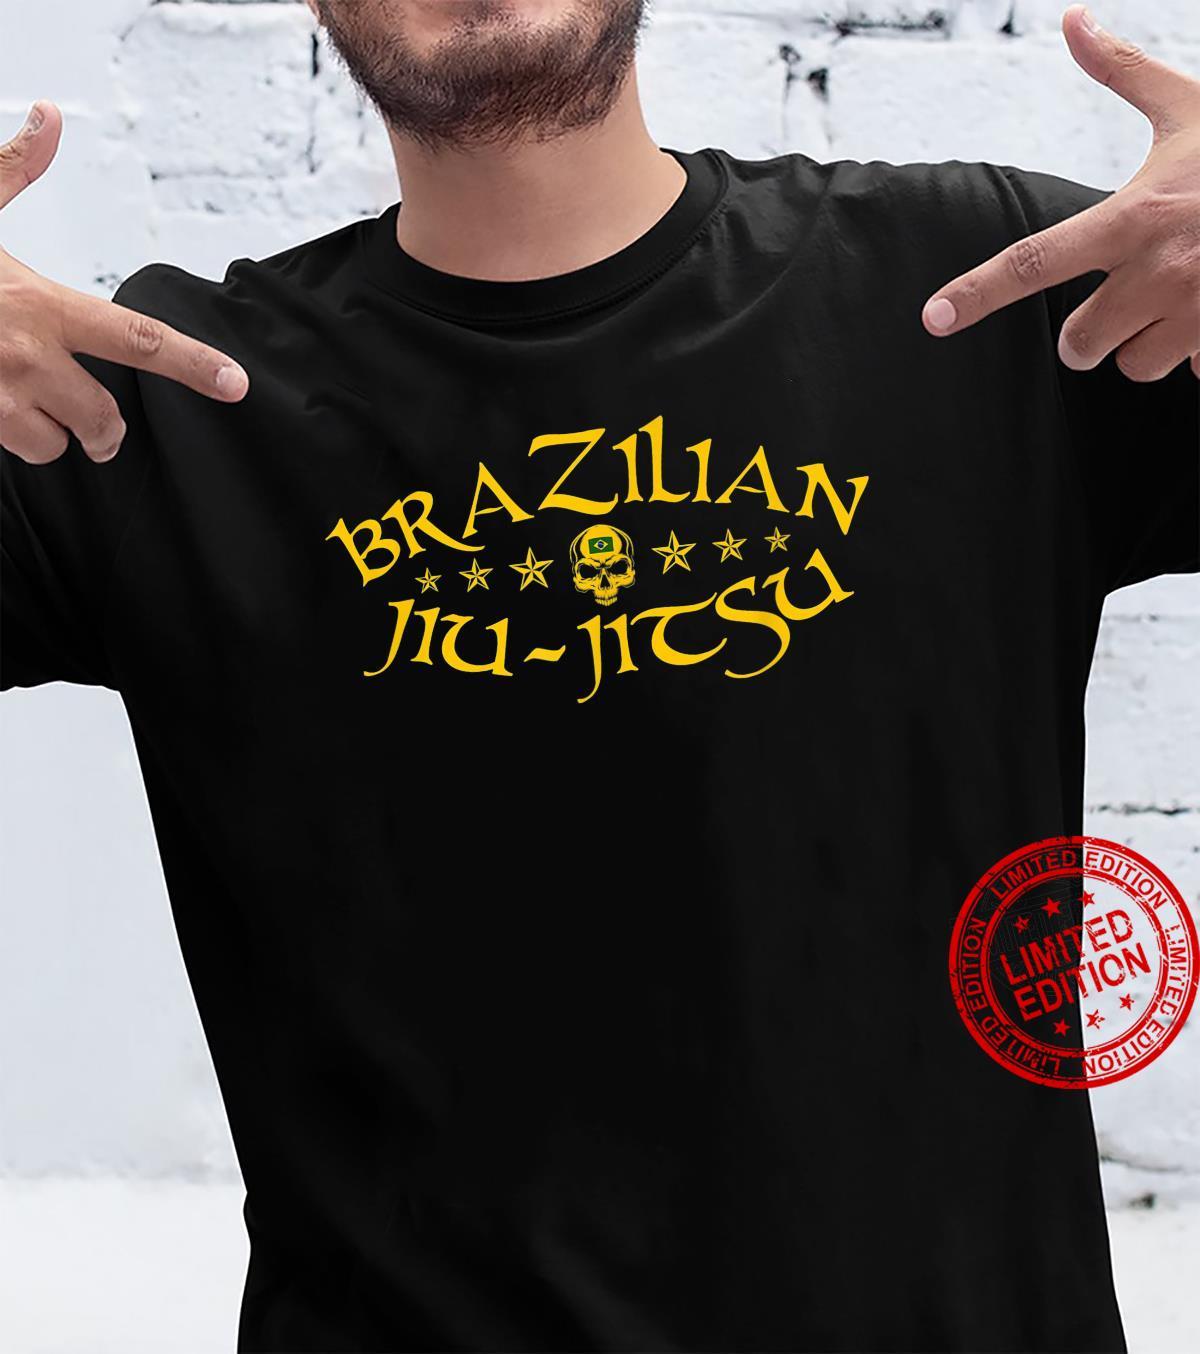 Brazilian JiuJitsu Schädel Shirt